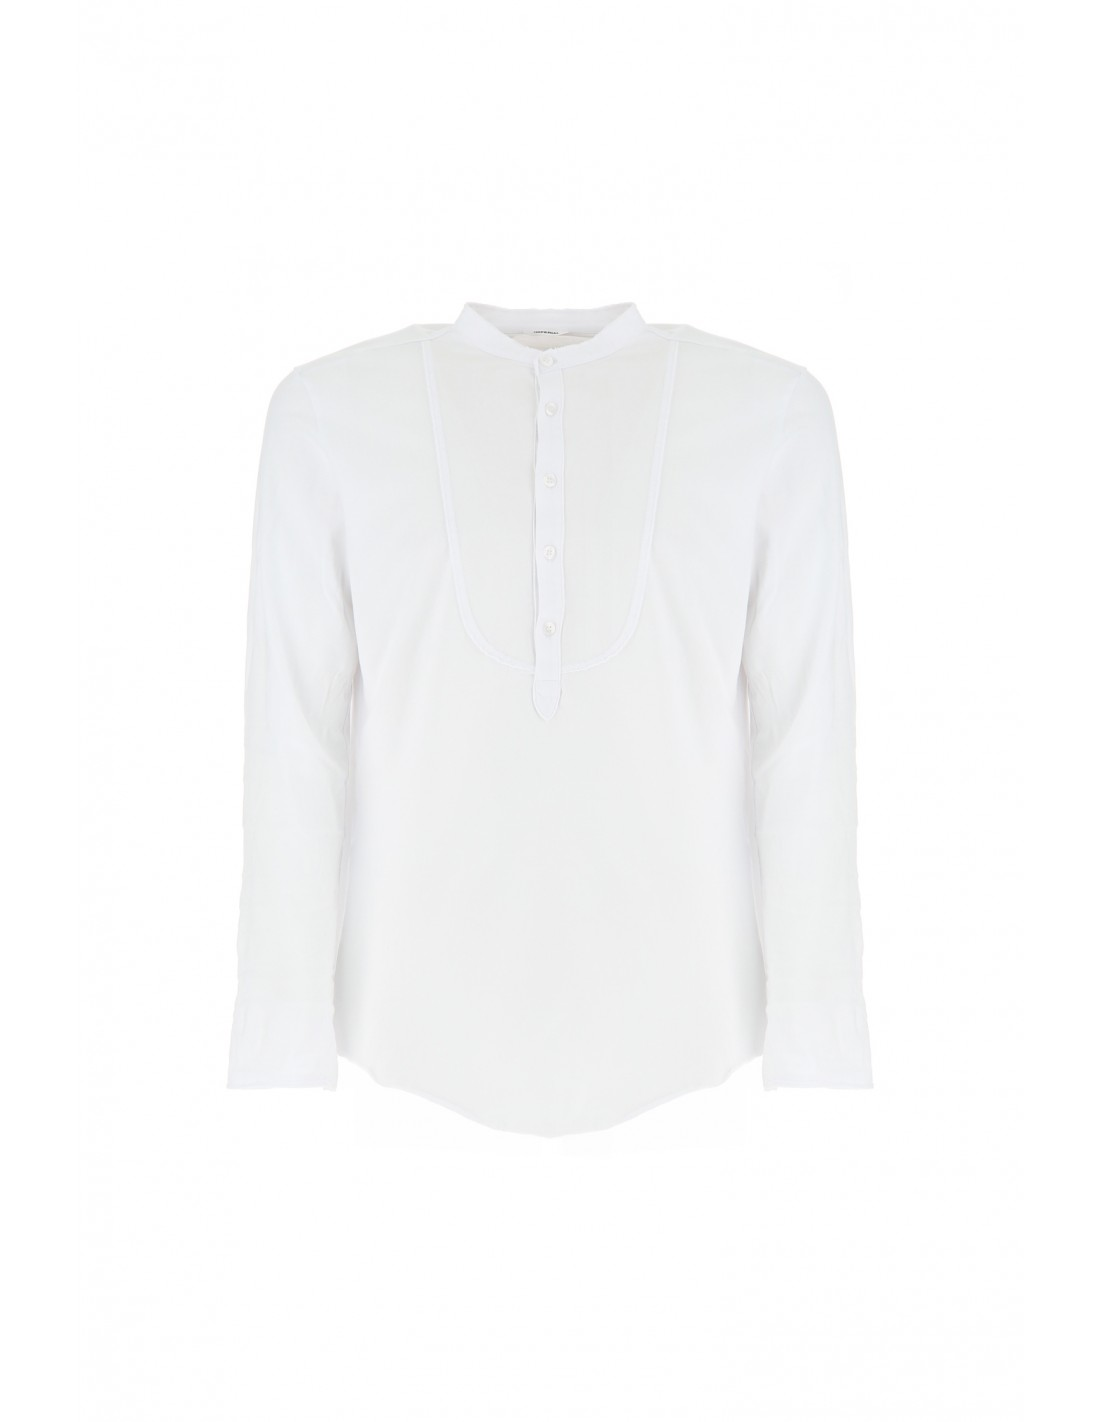 960b940350 tee-shirt-imperial-col-officier-coloris-blanc.jpg